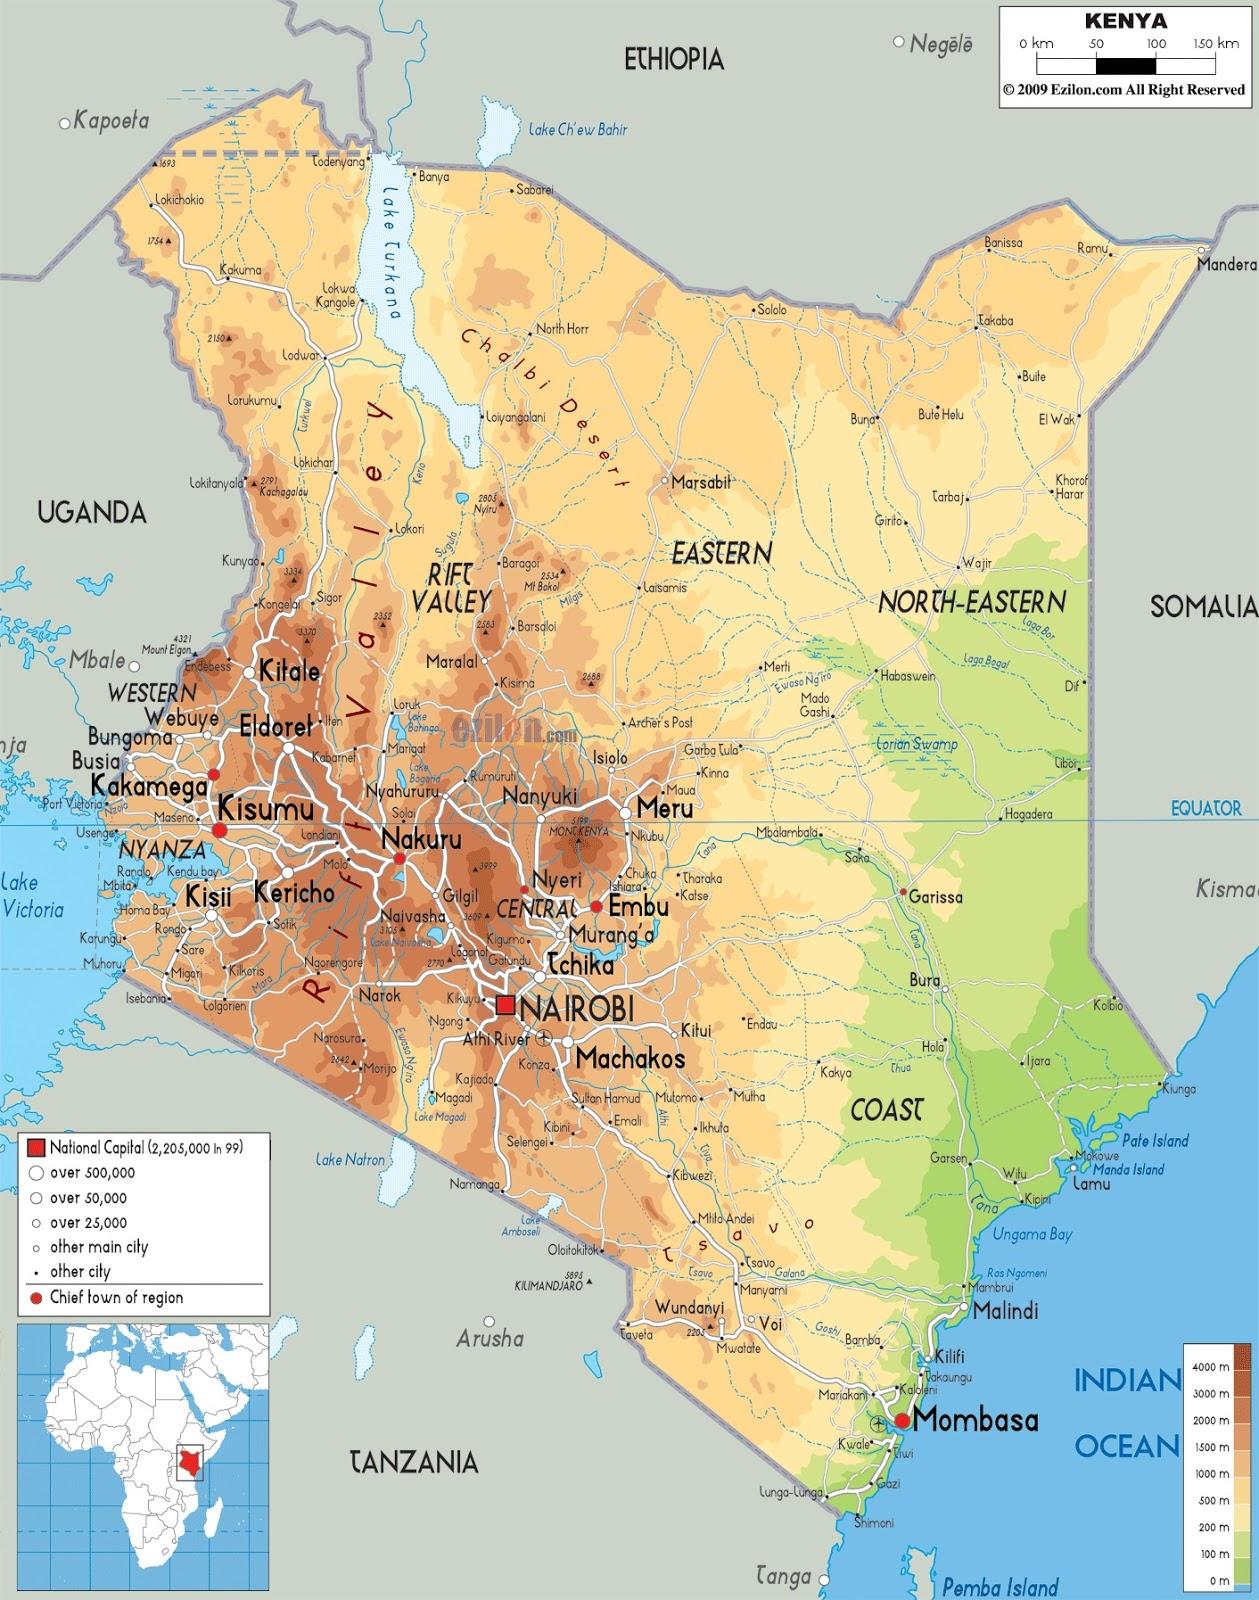 ANTHROPOLOGY OF ACCORD Map on Monday KENYA